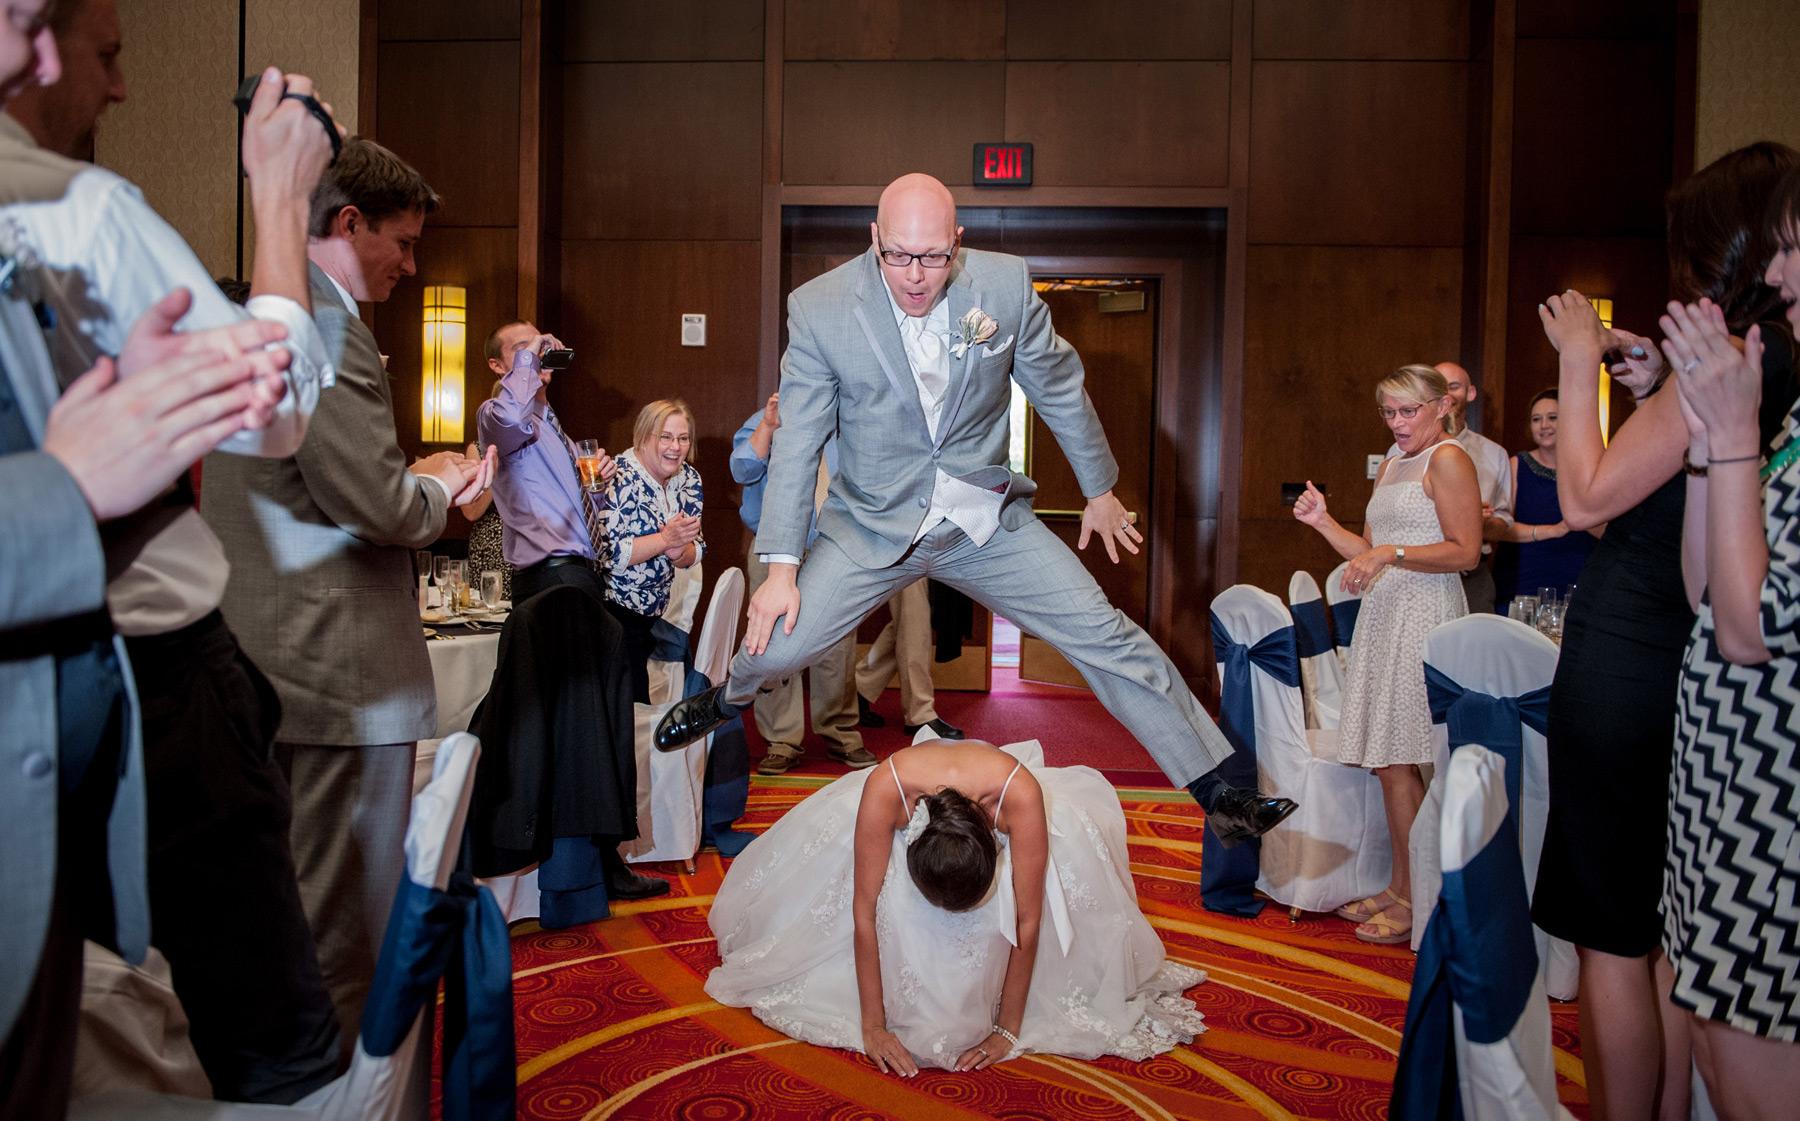 wedding-photography-saint-paul-mark-kegans-613.jpg